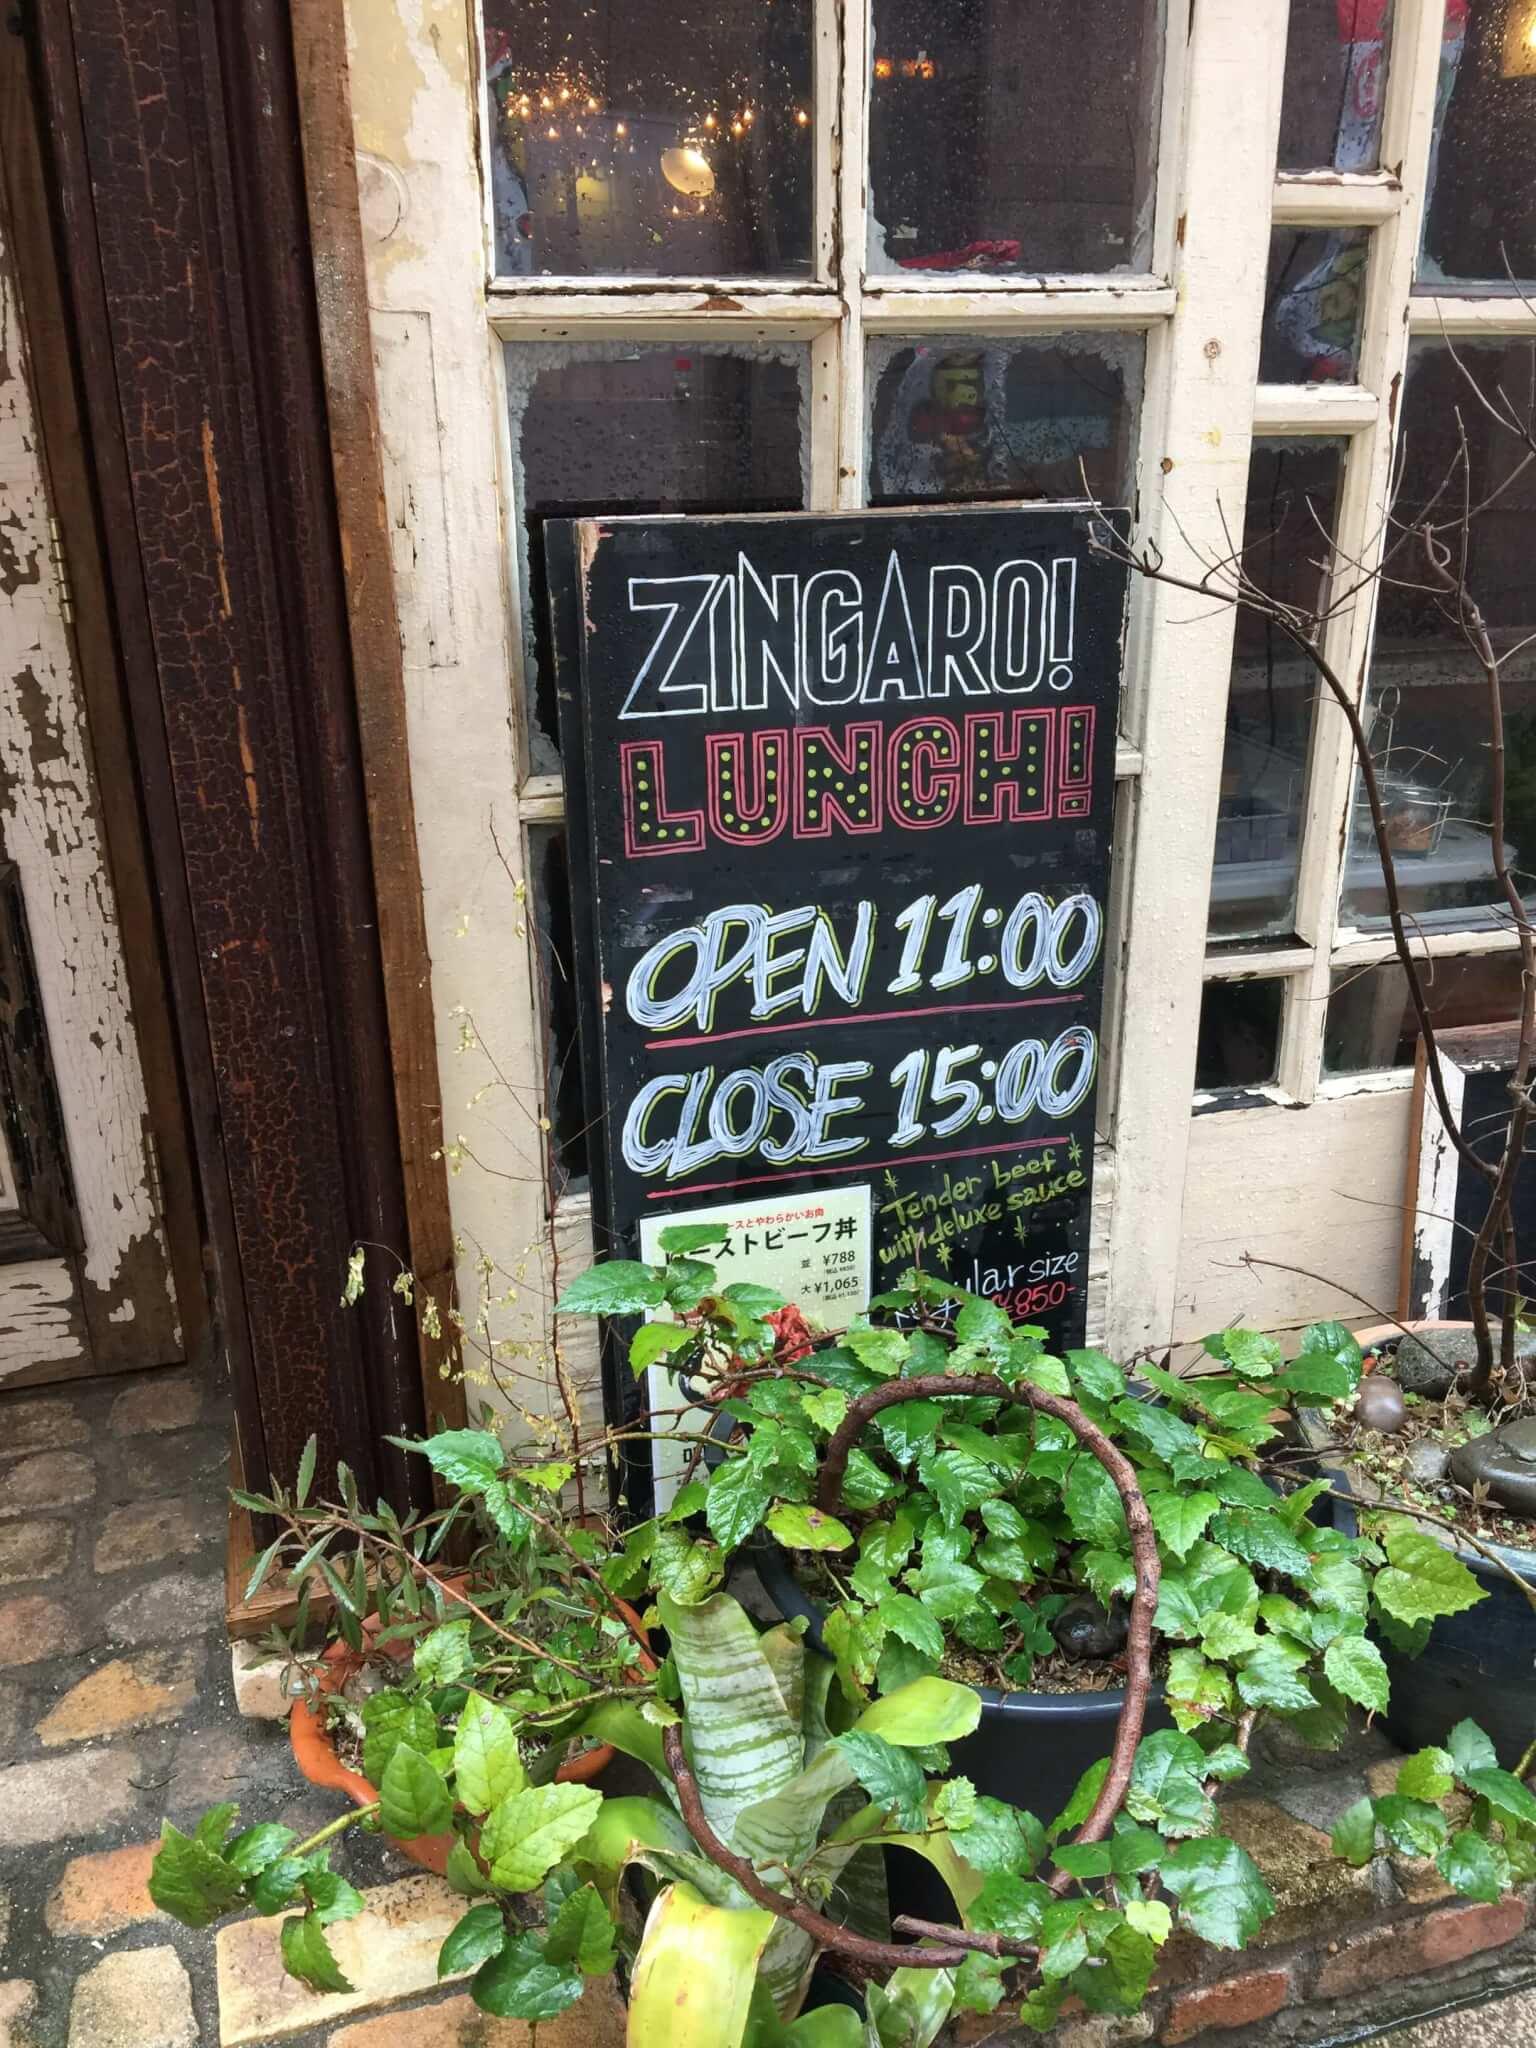 鹿児島zingaroの営業時間看板